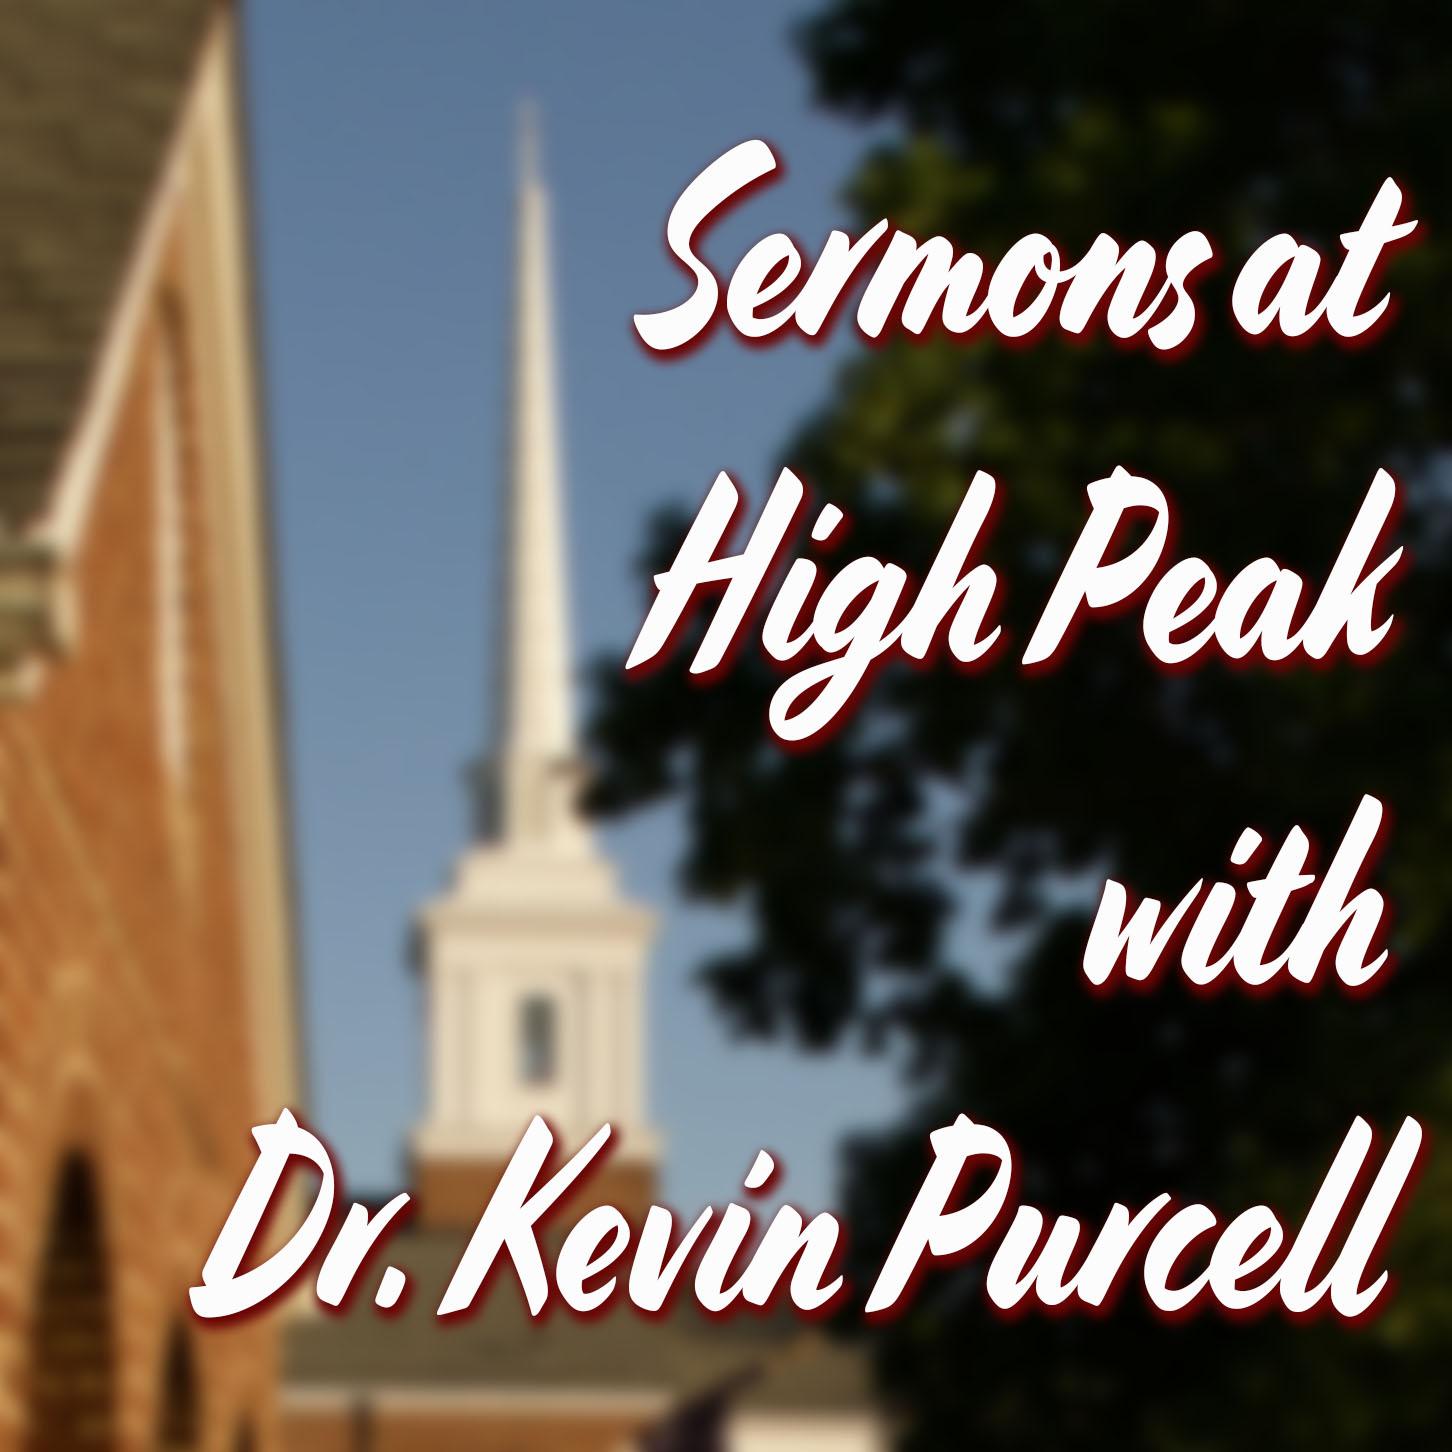 Sermons at High Peak Podcast